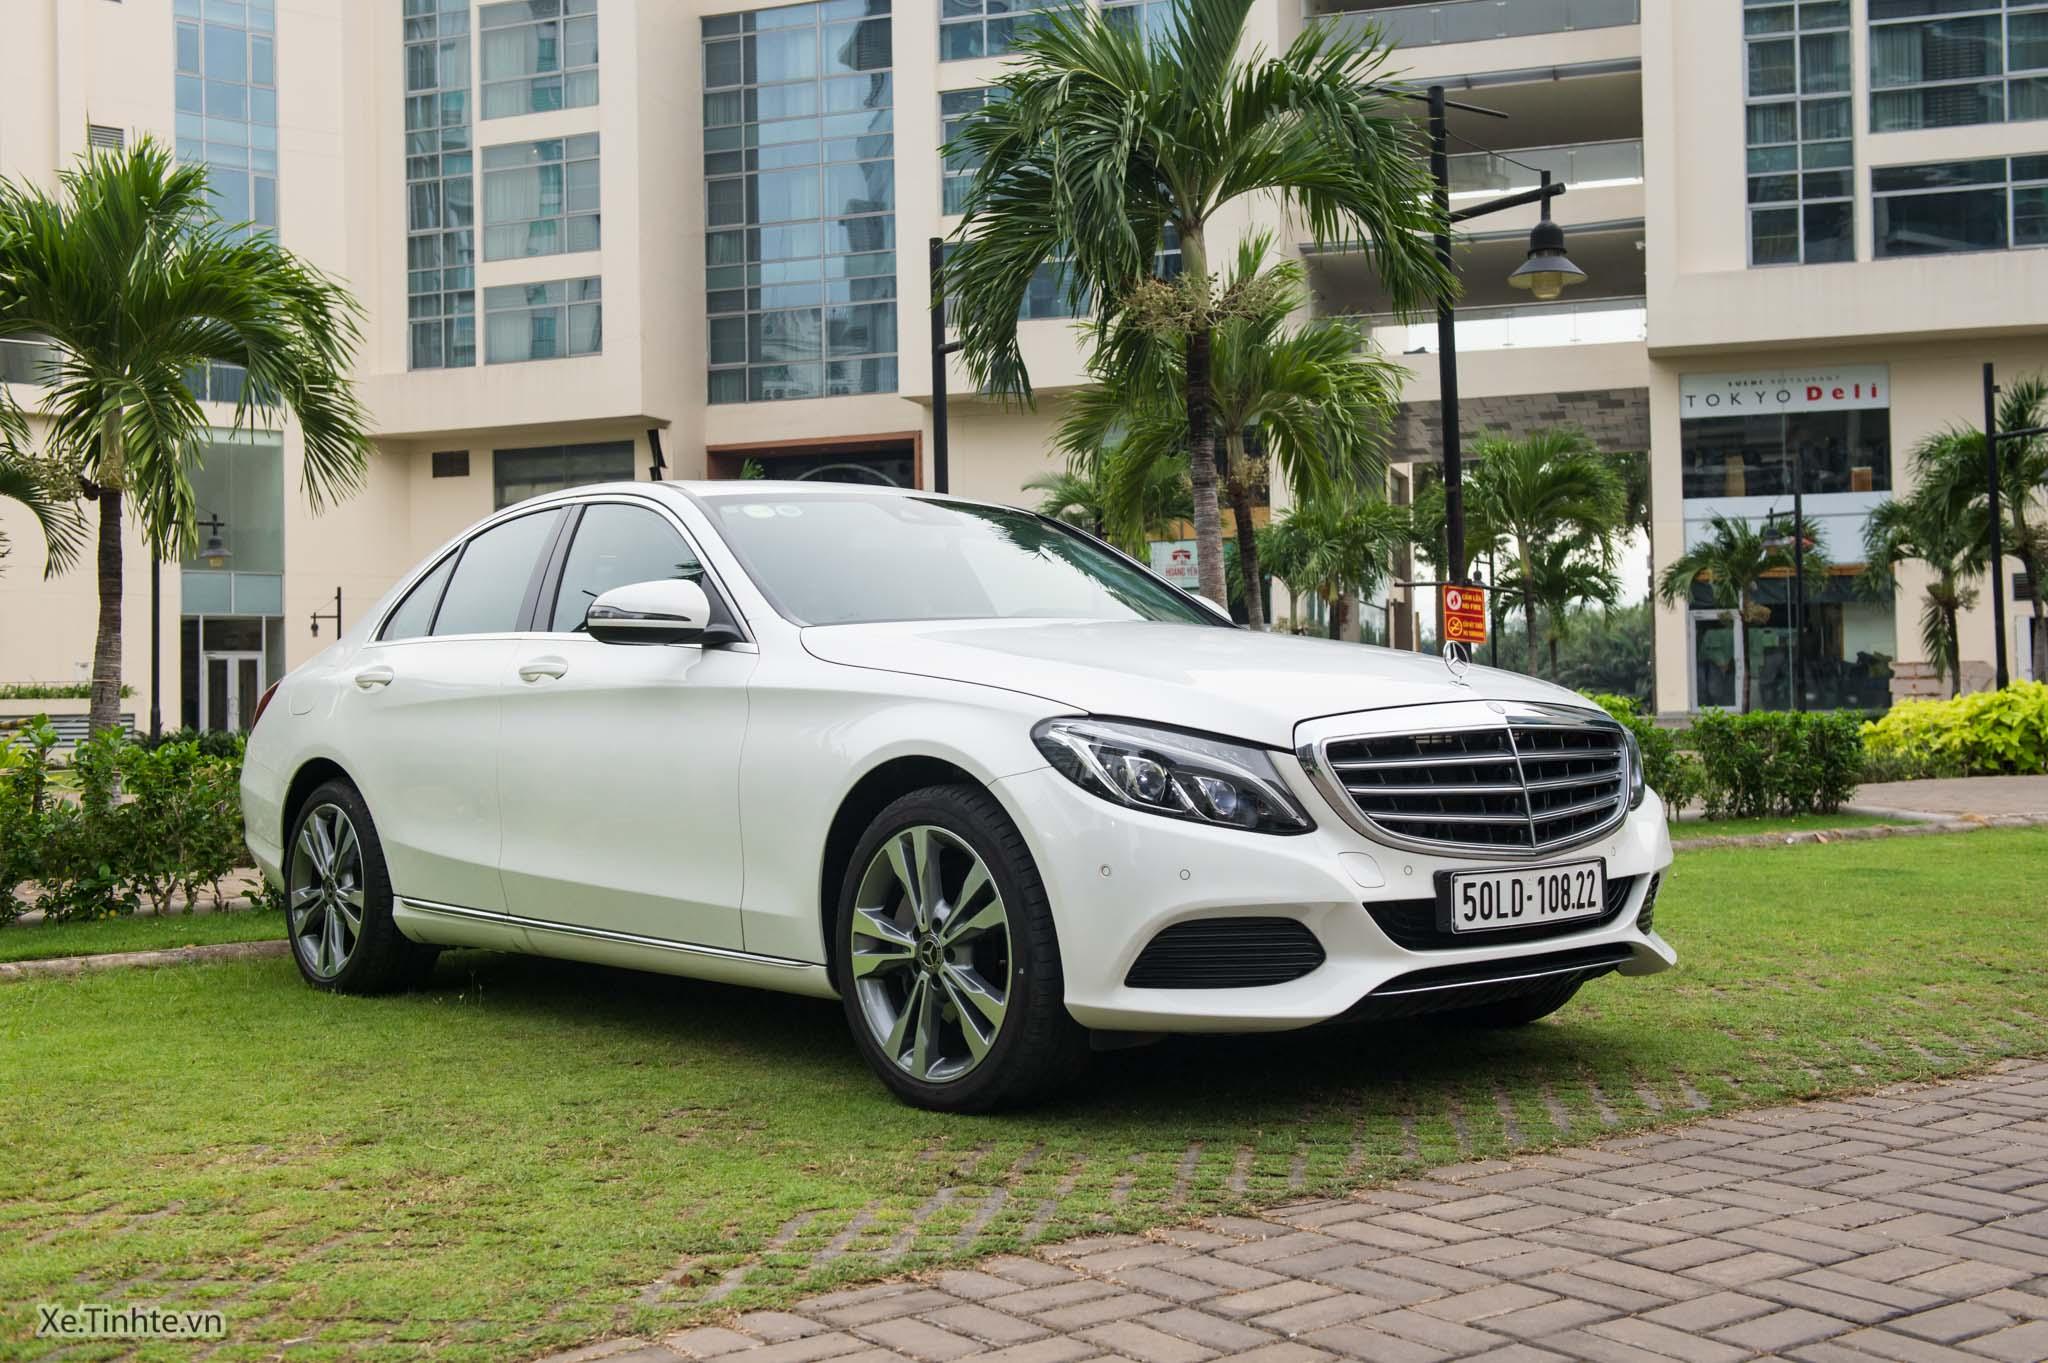 Mercedes_C250 Exclusive_Xe.tinhte.vn-7284.jpg